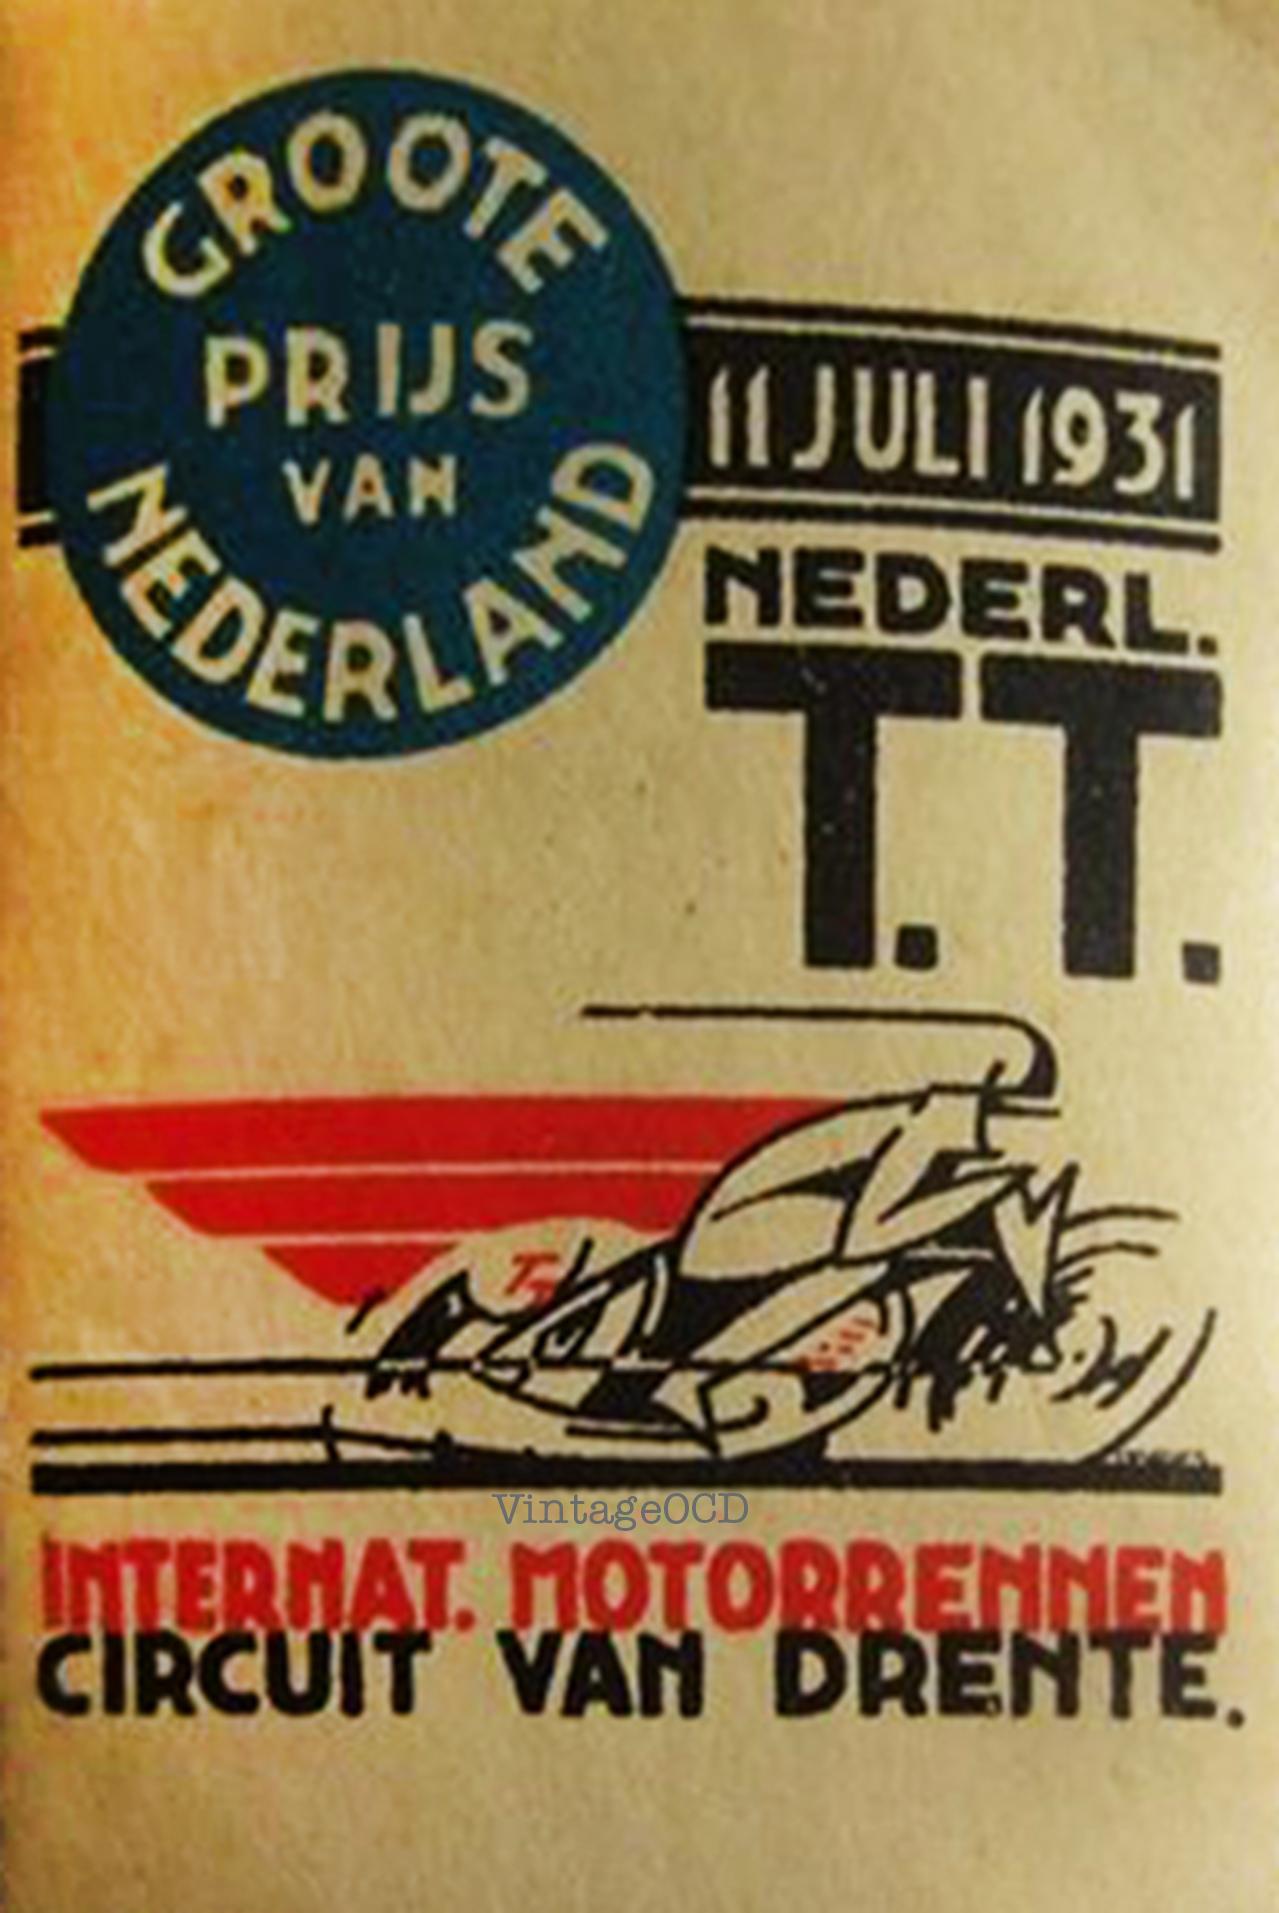 motorcycle racing poster vintage ocd. Black Bedroom Furniture Sets. Home Design Ideas